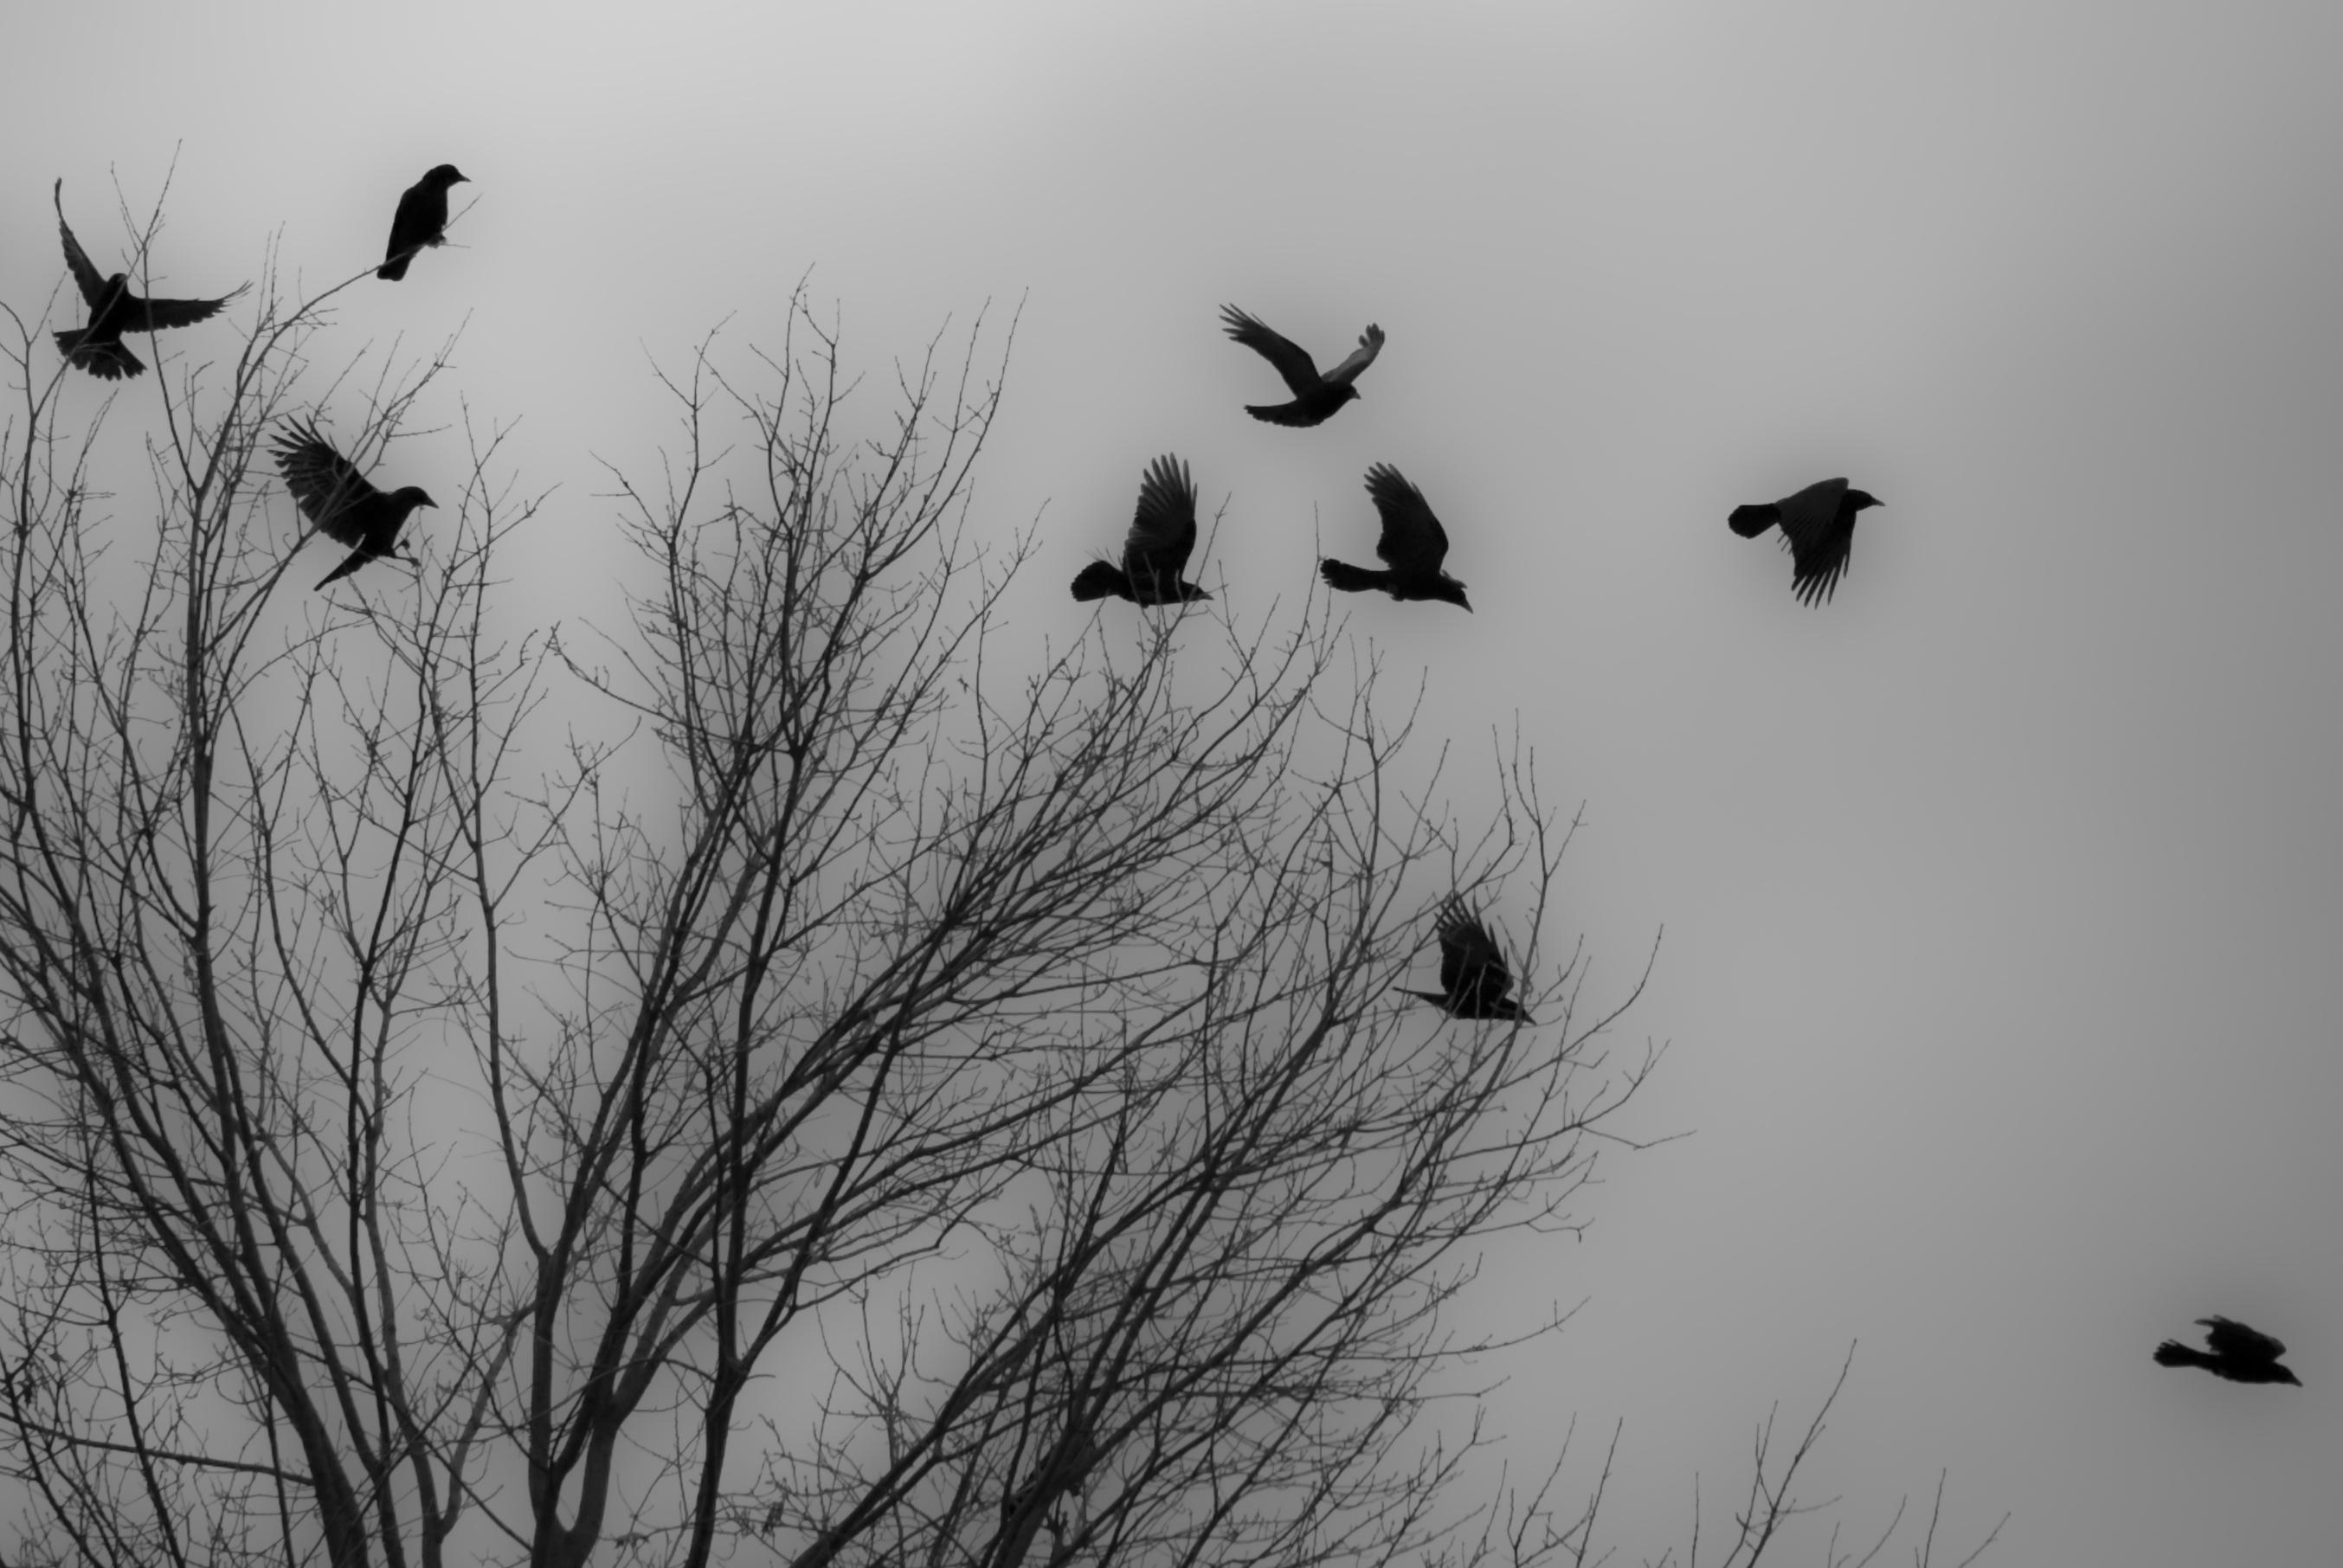 Black Crow Flying